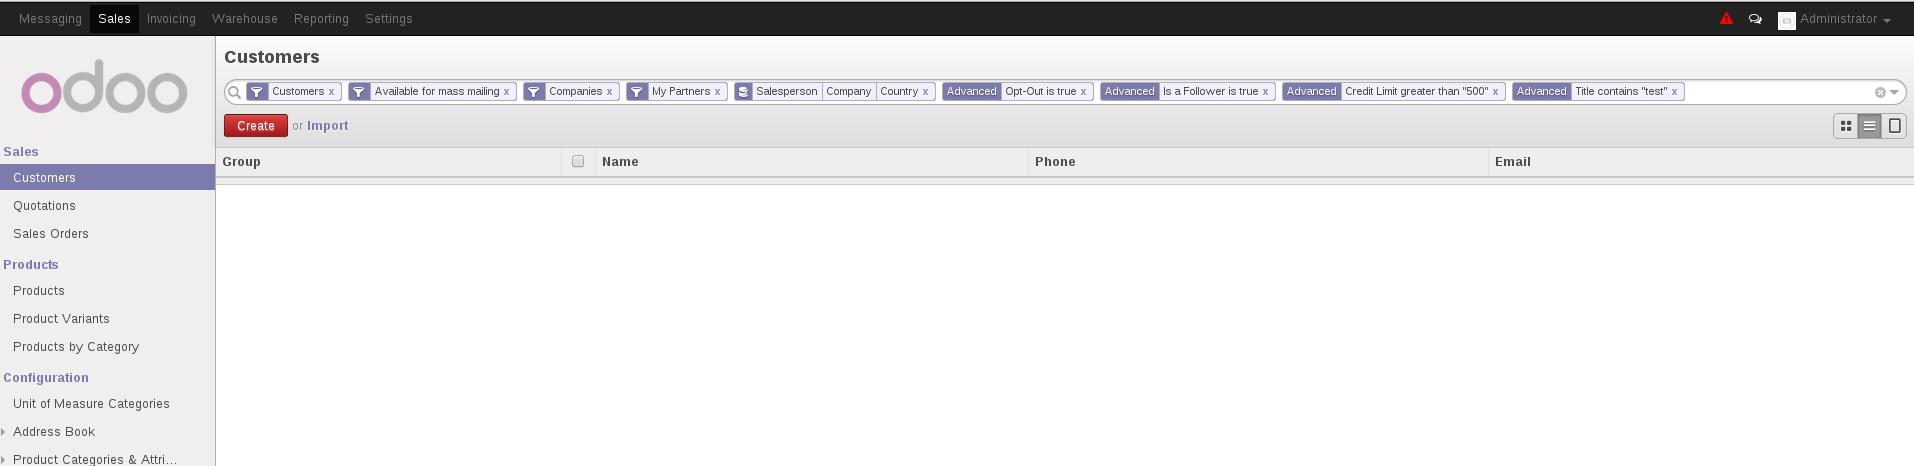 Searchbar over full screen width